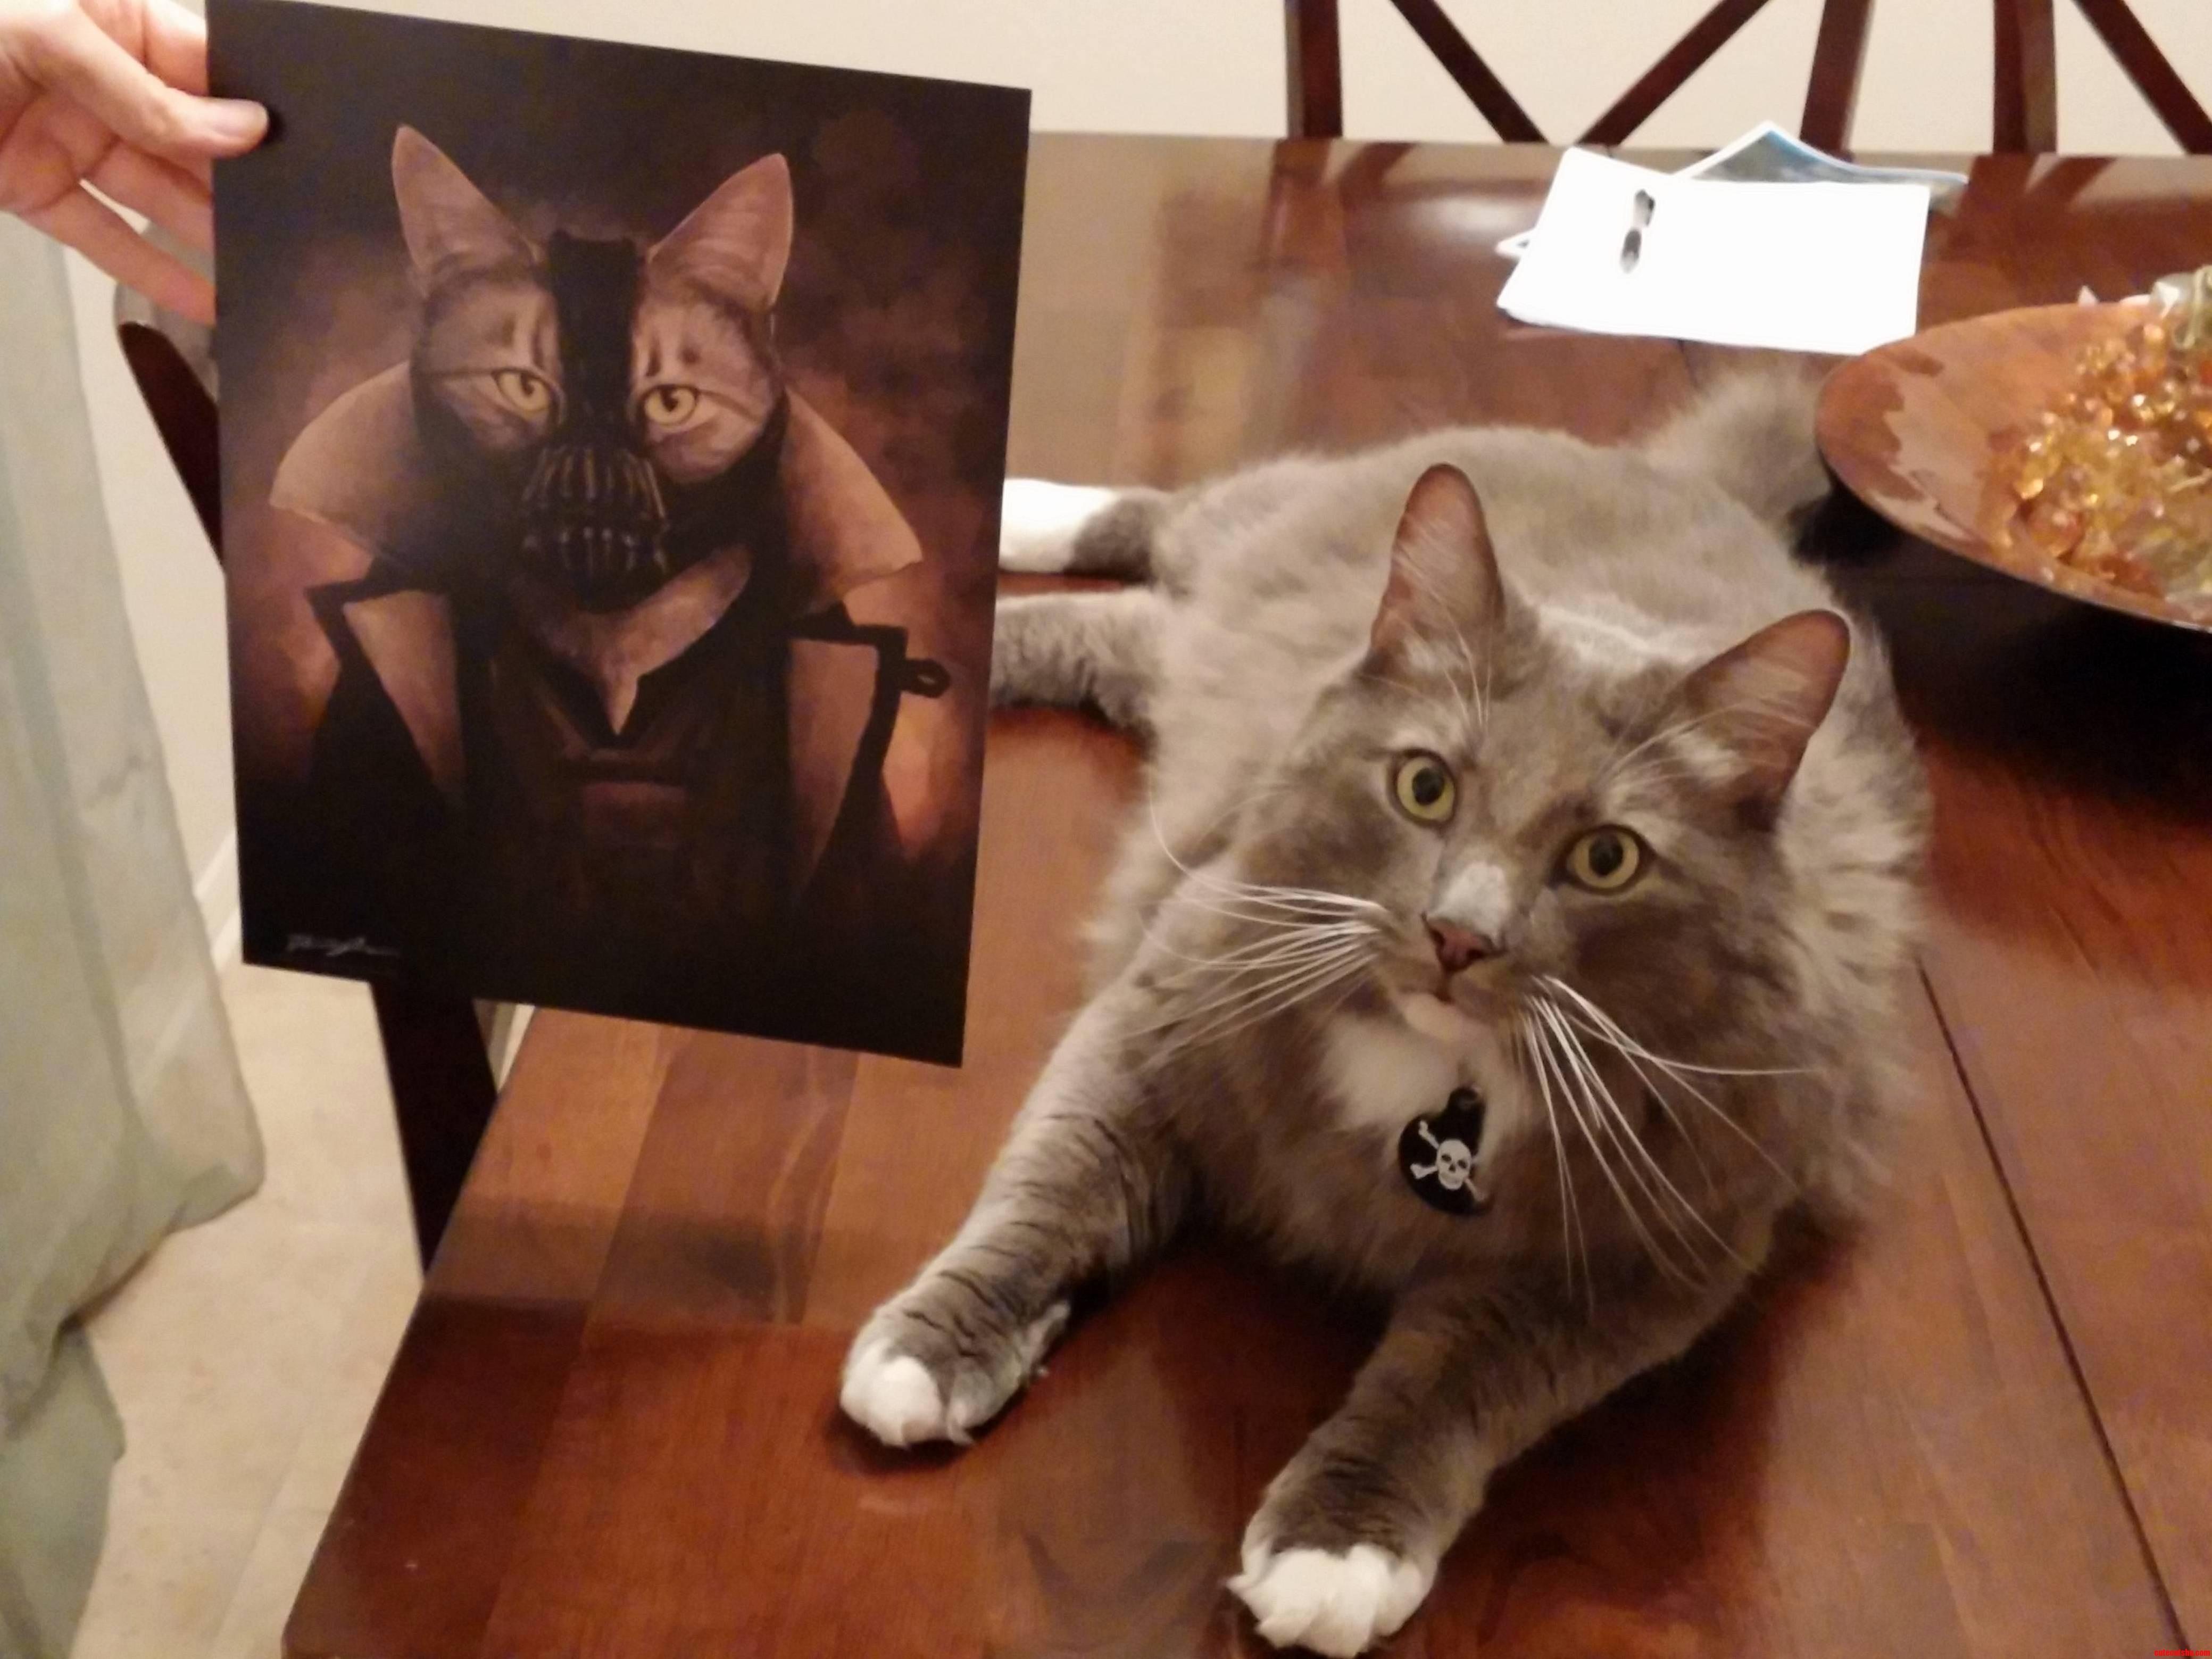 We Often Joke That Our Big Grey Cat Is Built Like Bane